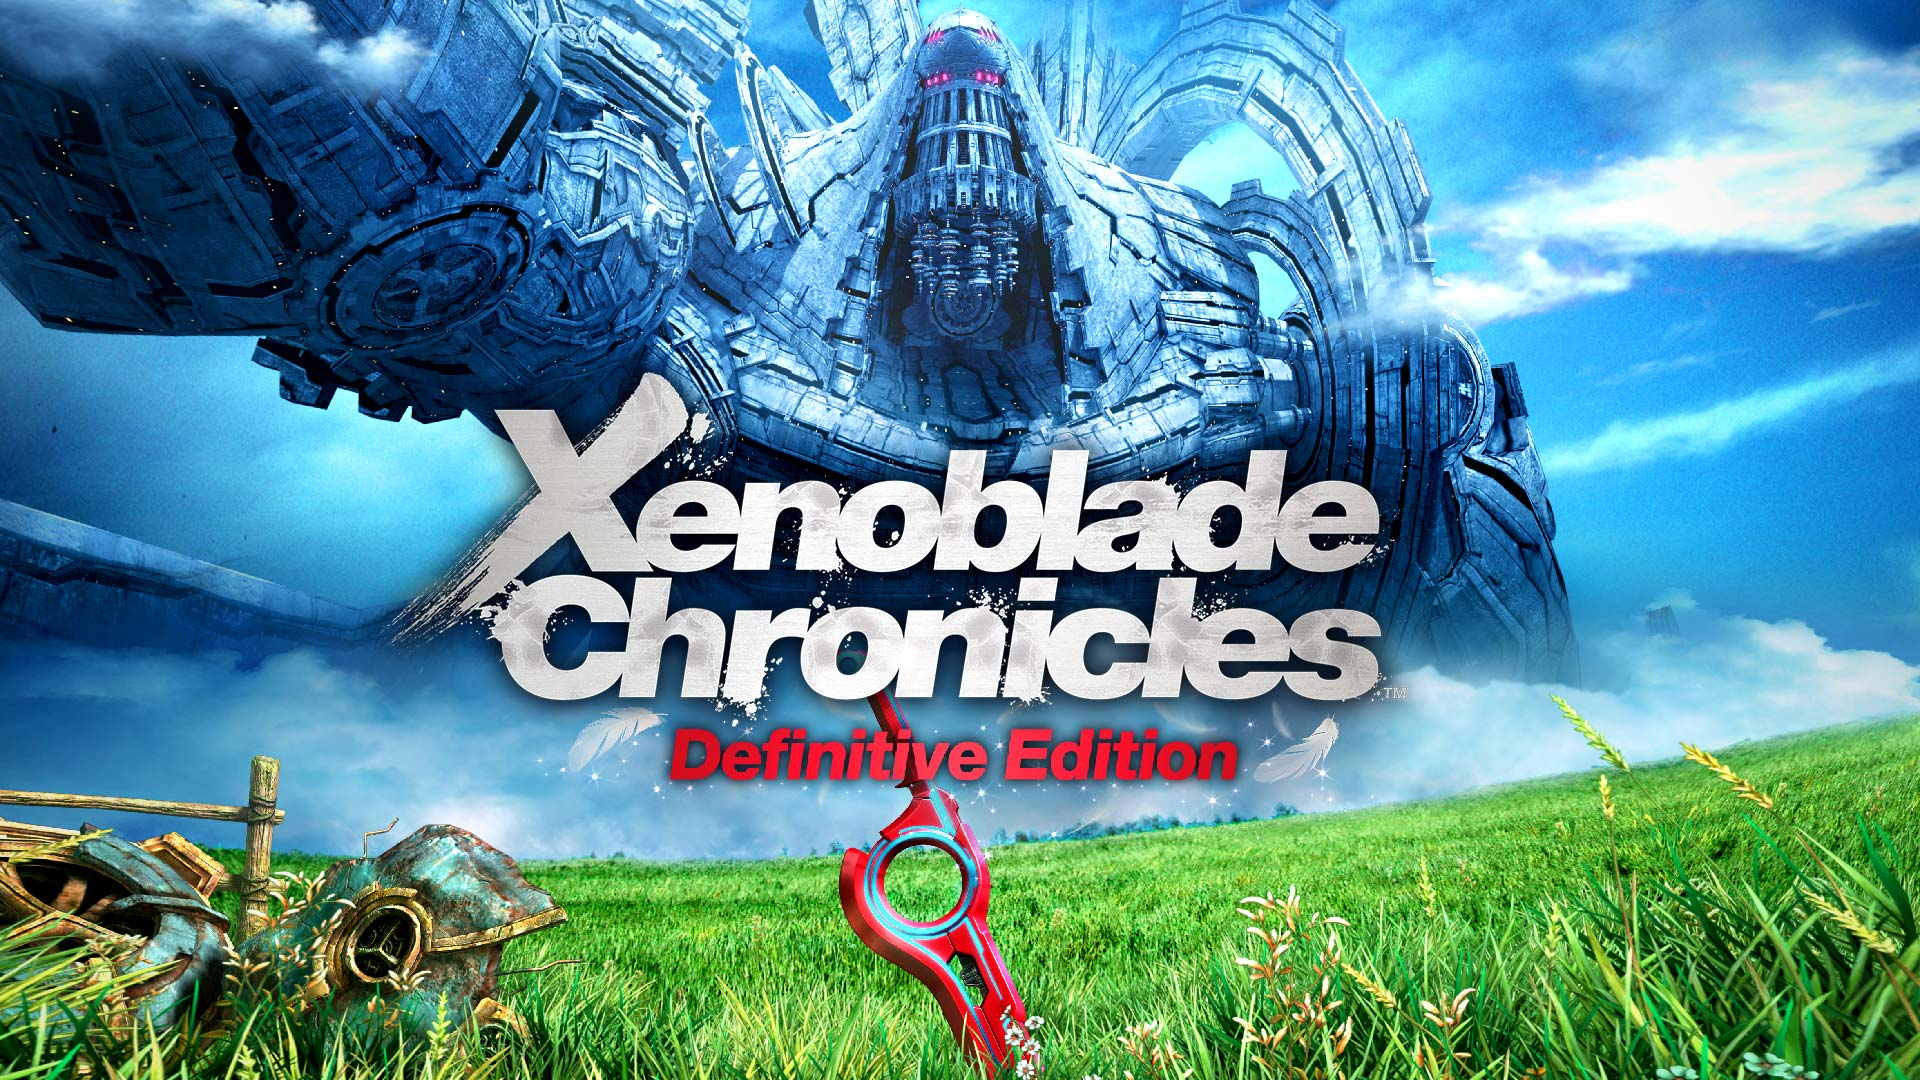 xenoblade chronicles, ether gems